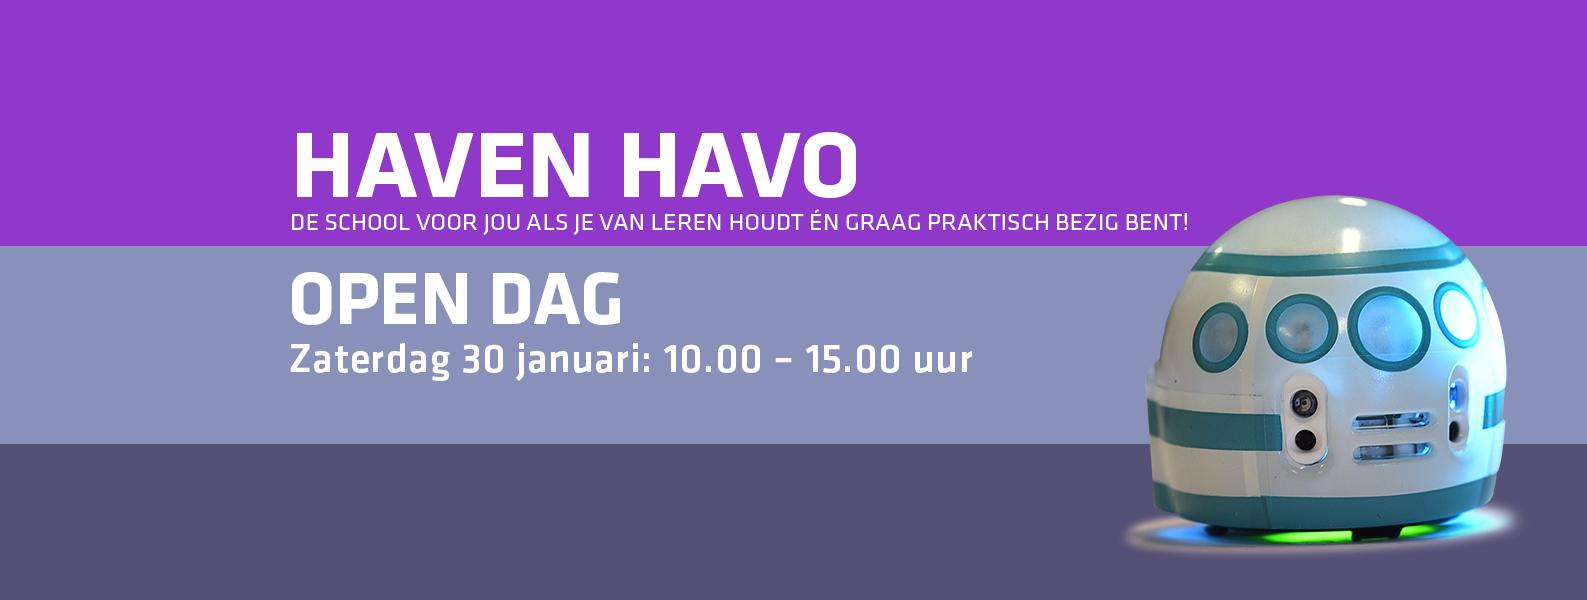 Haven Havo logo